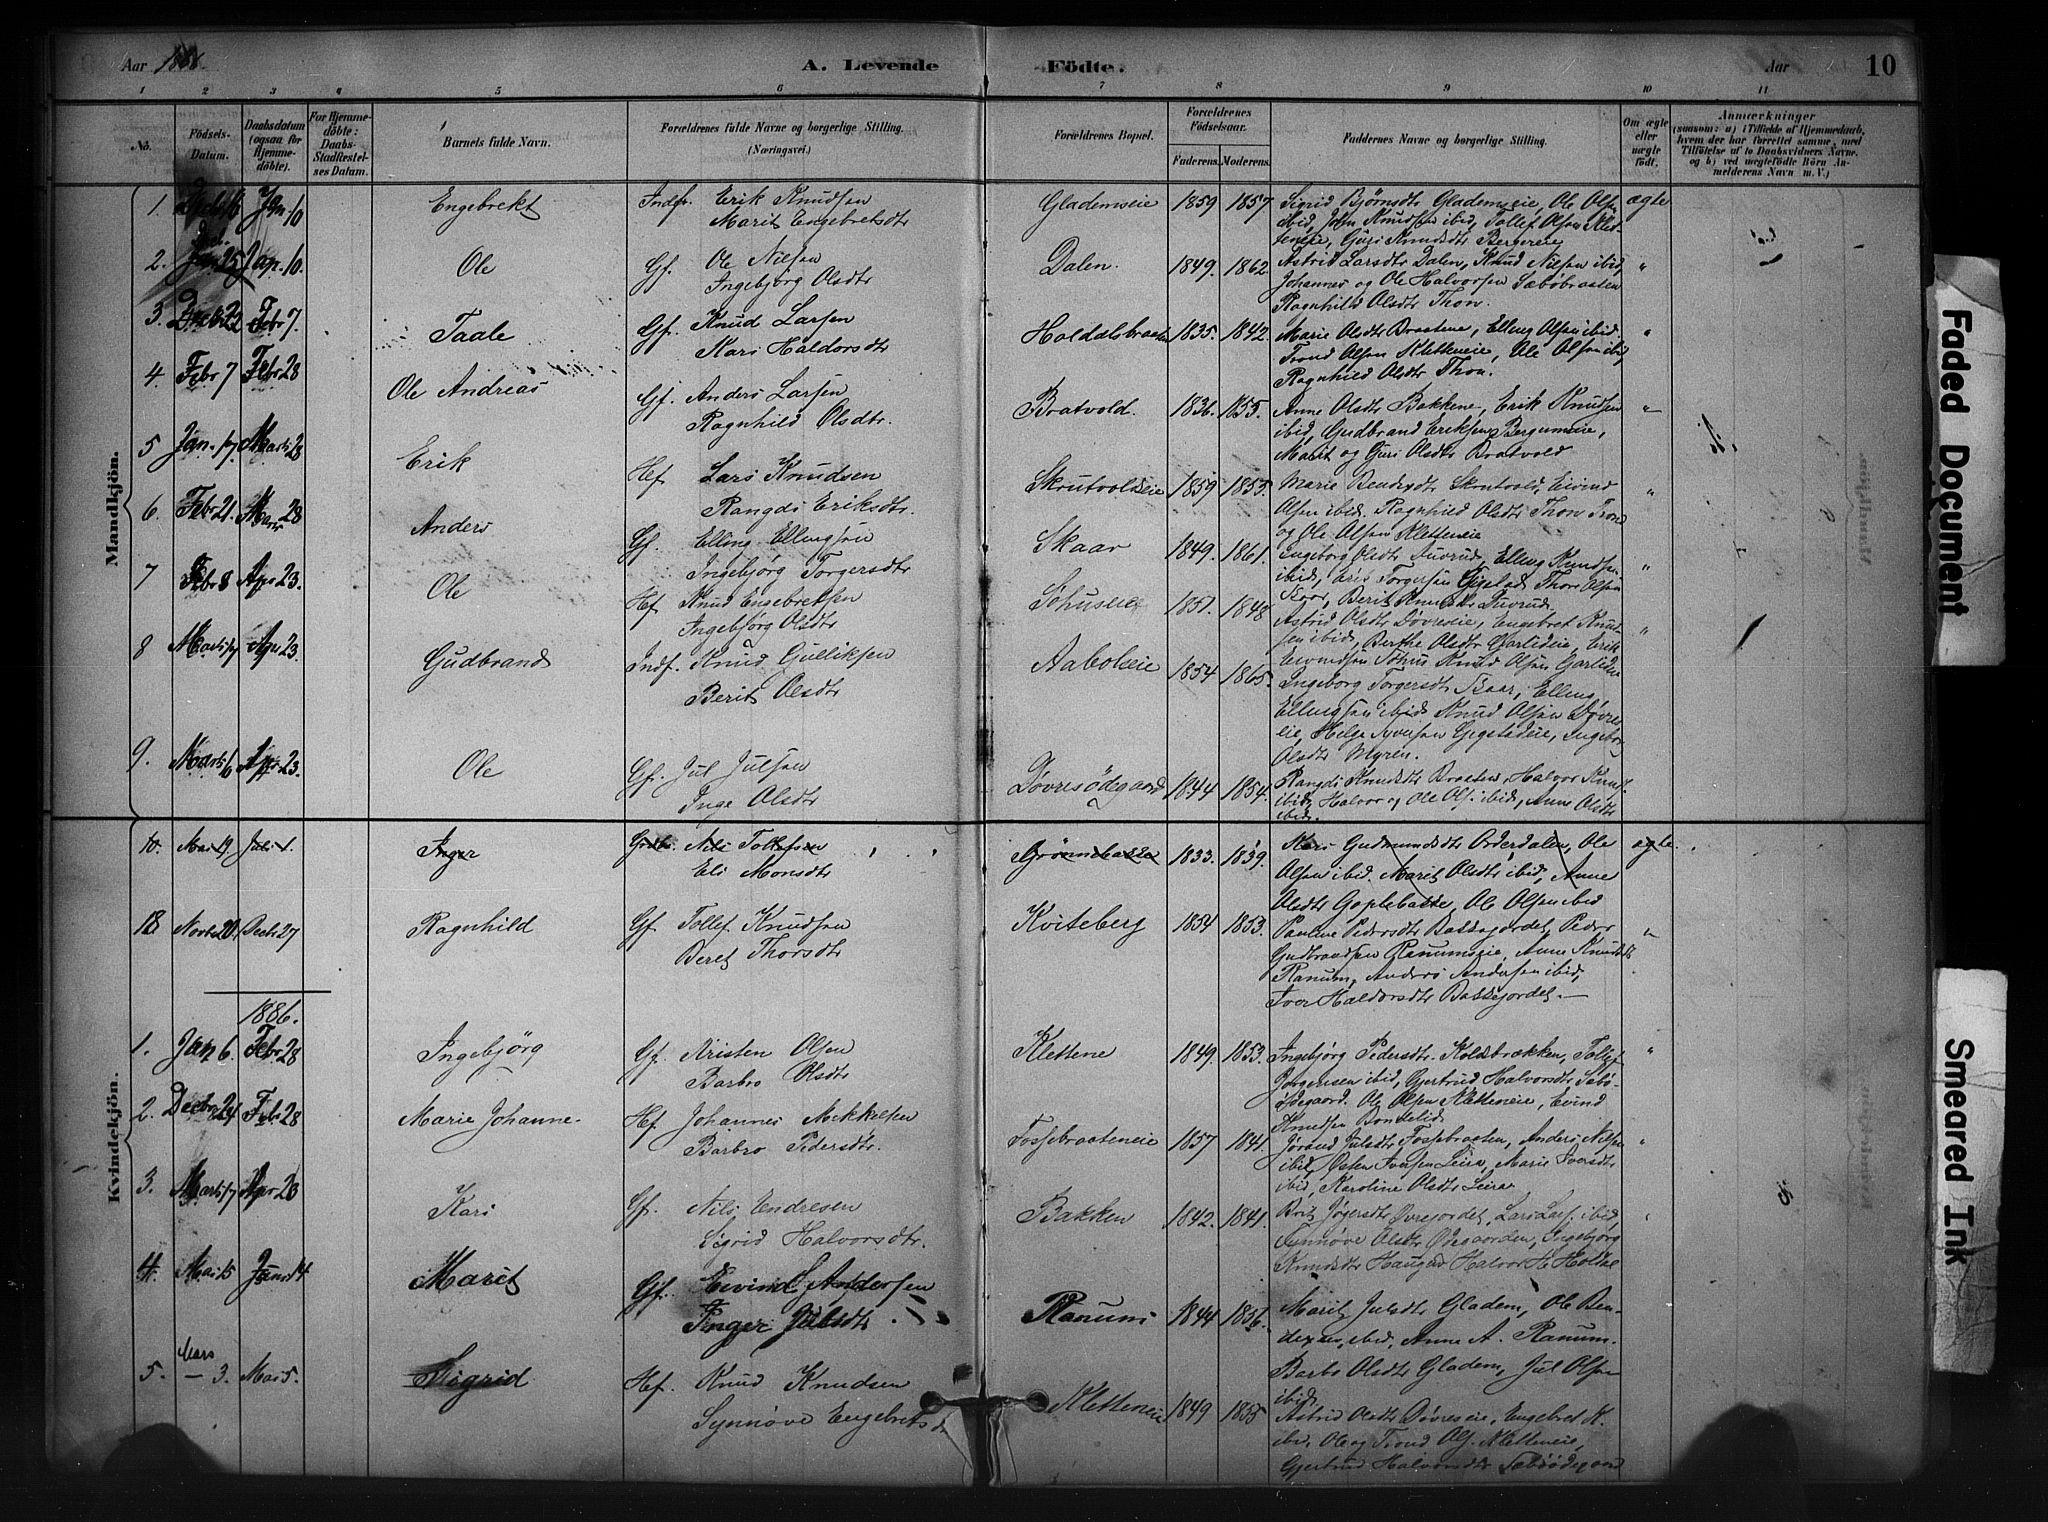 SAH, Nord-Aurdal prestekontor, Ministerialbok nr. 12, 1883-1895, s. 10